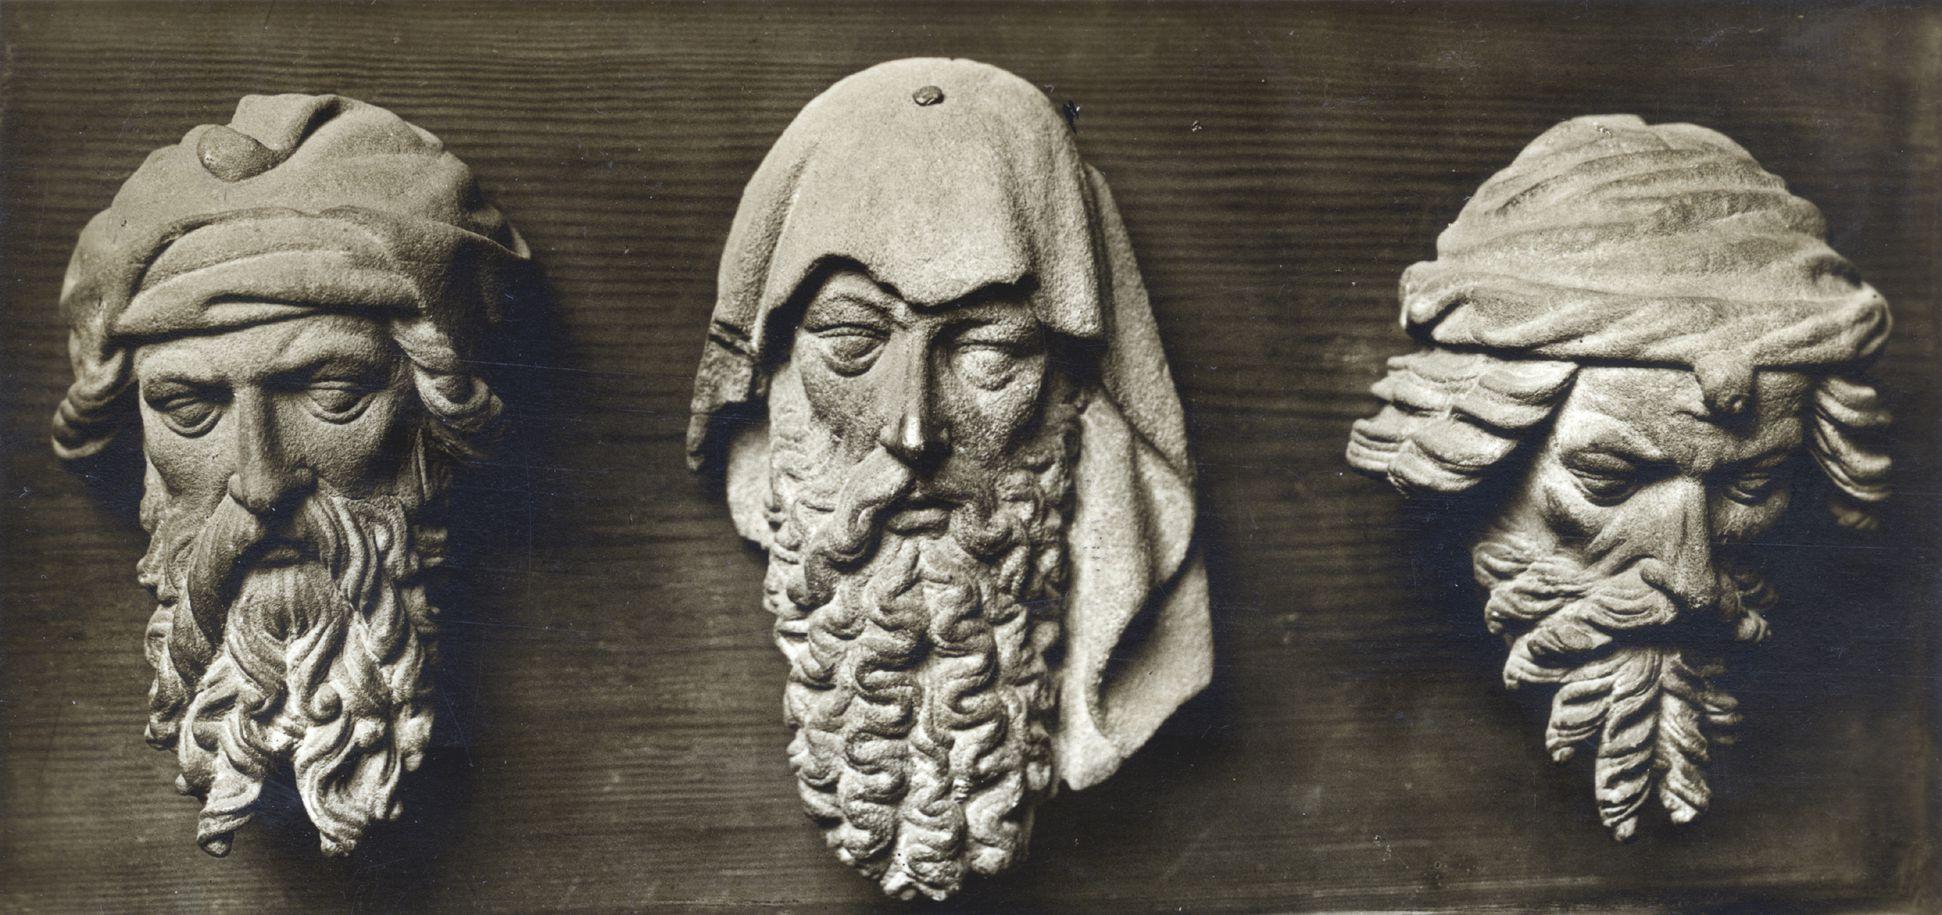 Schöner Brunnen Berlin Bode-Museum, Drei Prophetenköpfe, Foto der 1920er Jahre, Deutscher Kunstverlag